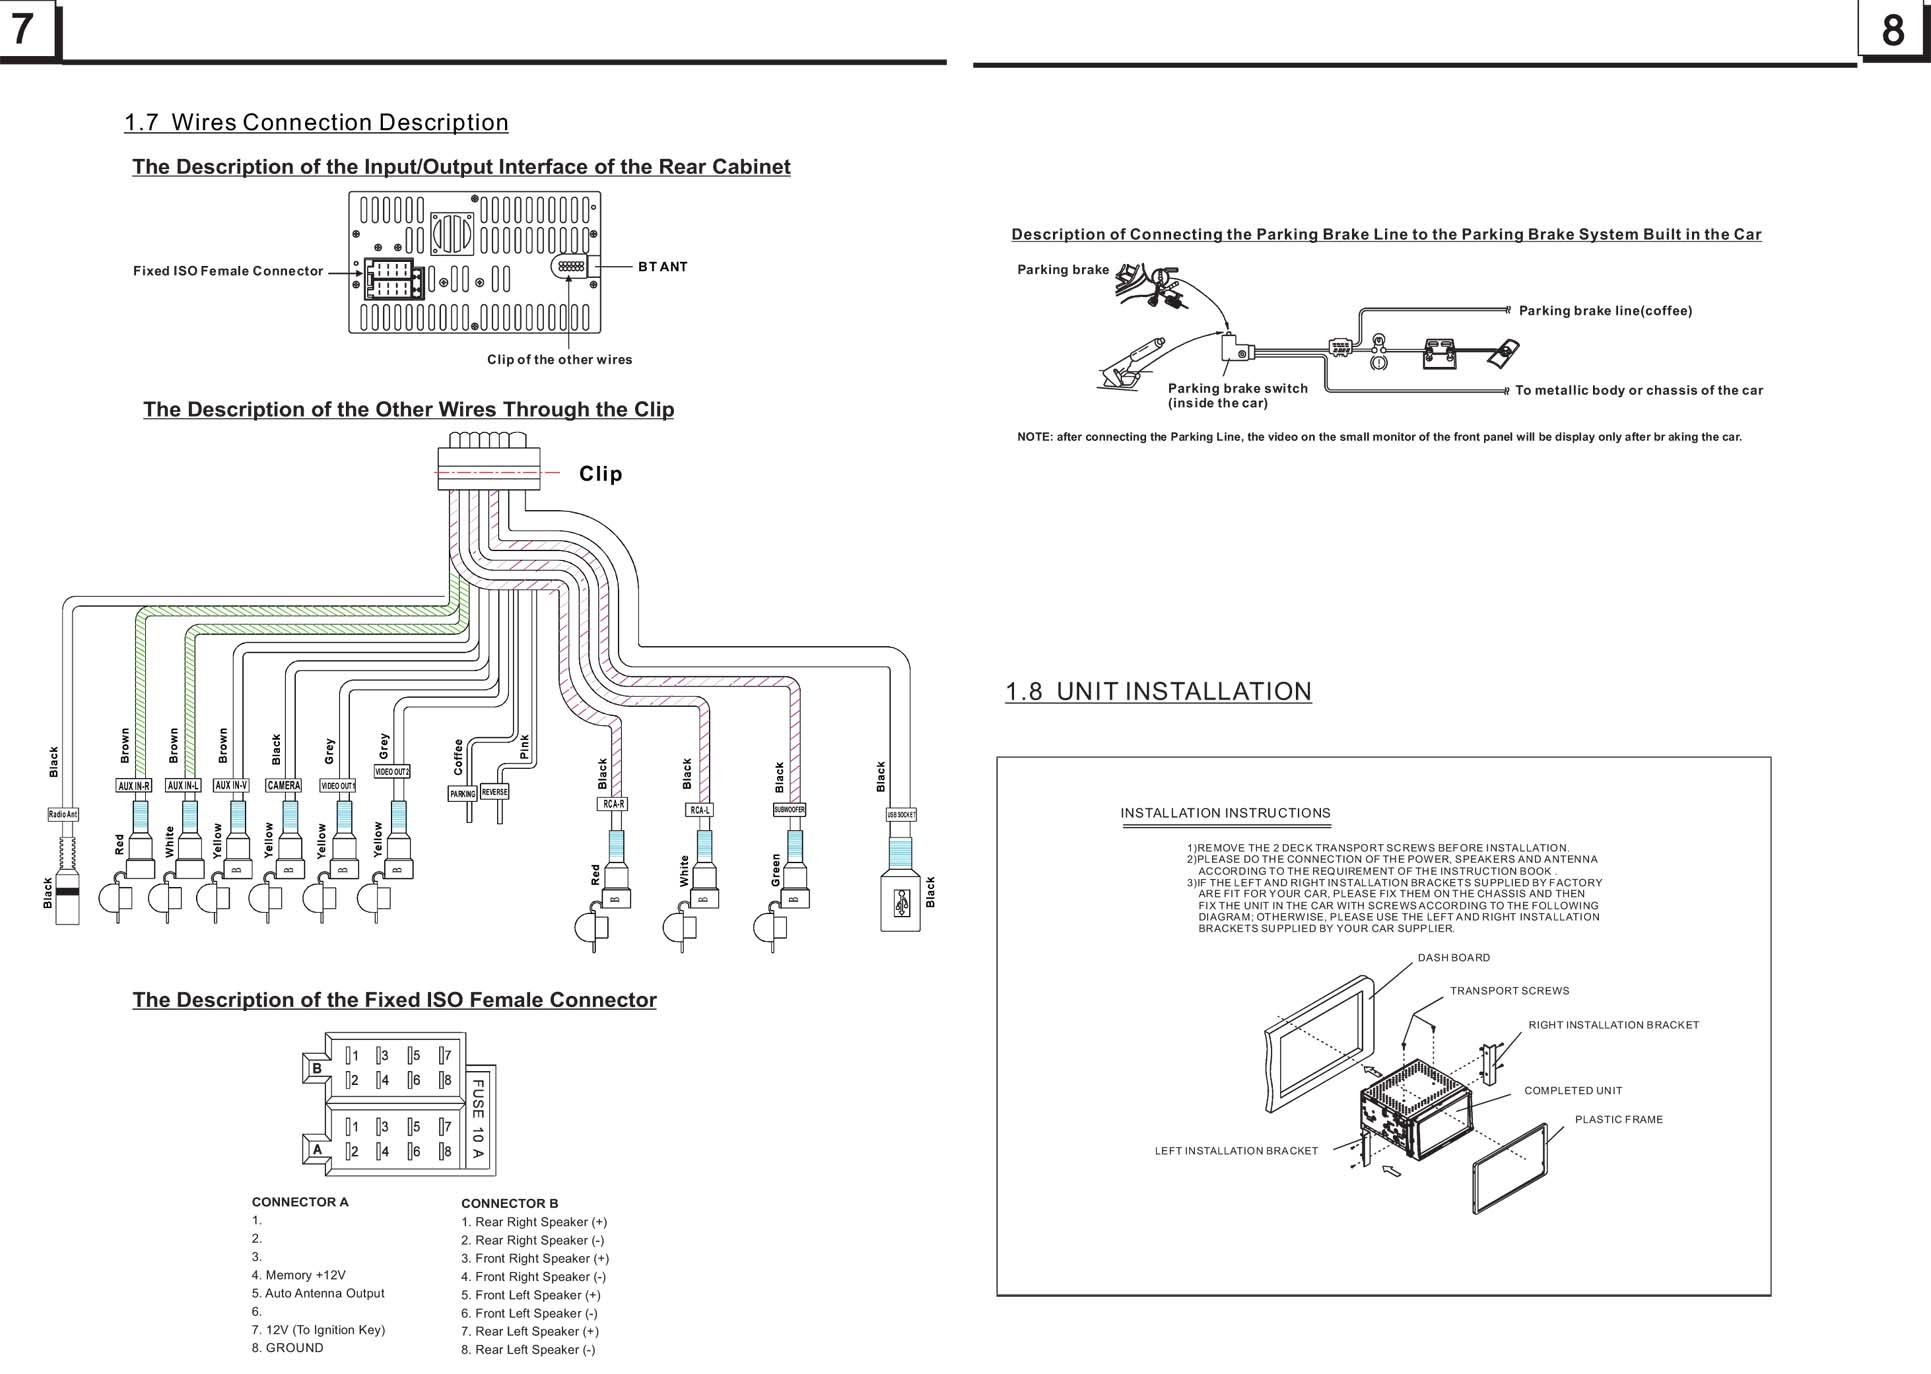 pyle view pldnv78i wiring diagram pyle pldn74bti wiring diagram – car audio systems pyle waterproof speaker wiring diagram #5